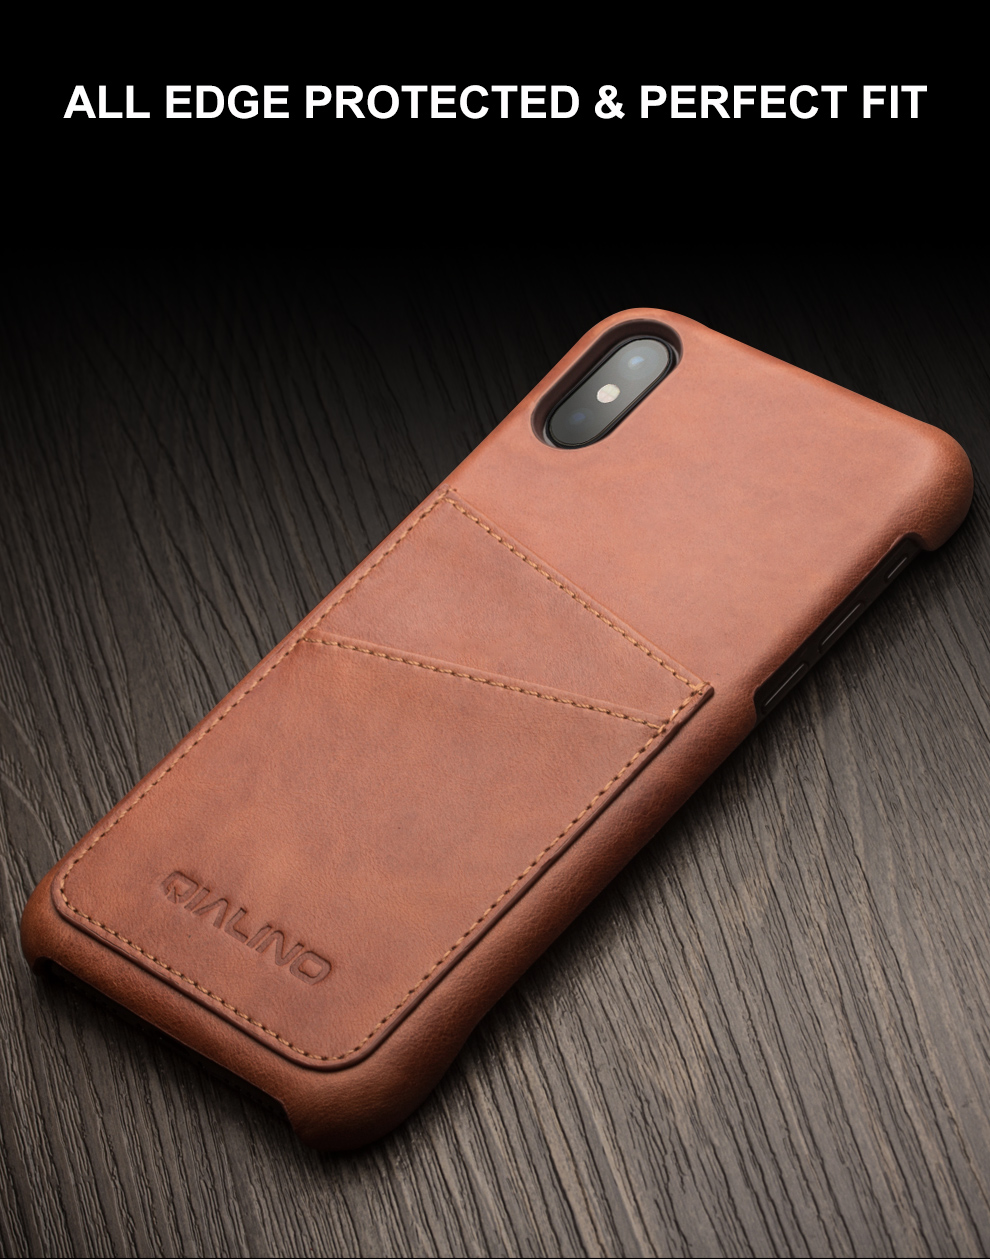 QIALINO Luxury Handmade Back Case Fashion Genuine Leather Card Slot Ultrathin Phone Bag Cover